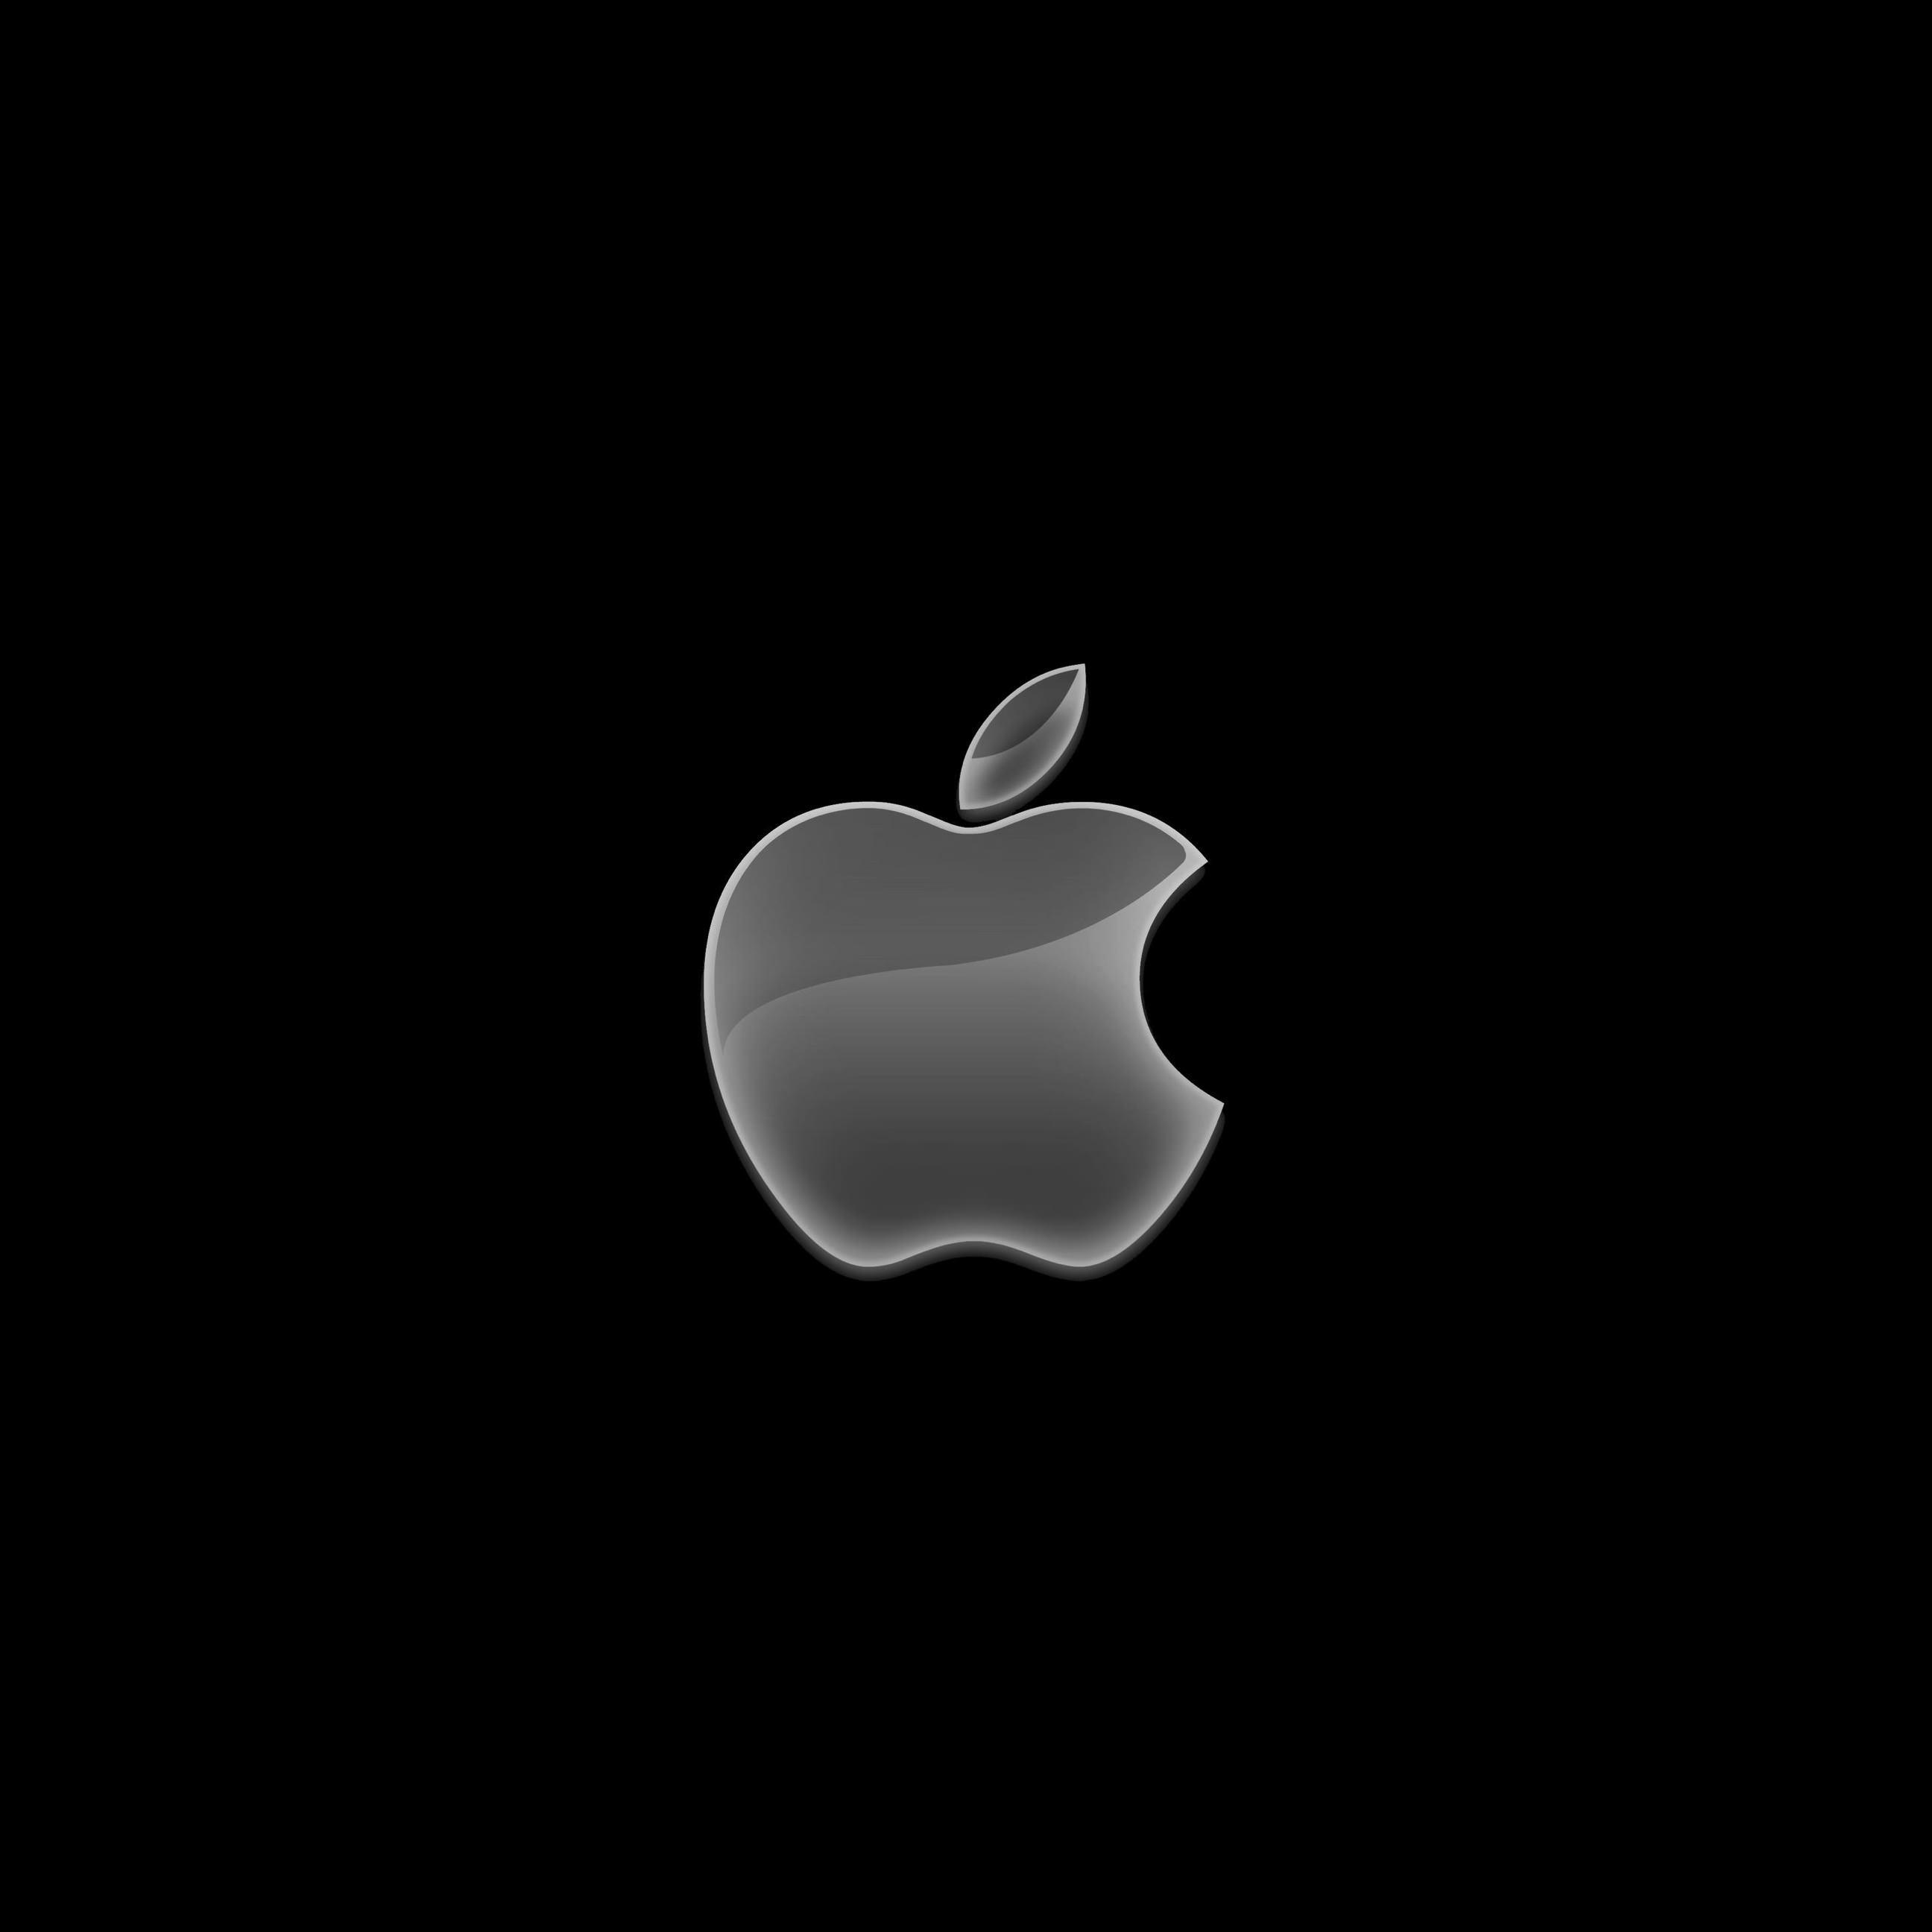 Appleロゴ黒クール Wallpaper Sc Ipad壁紙